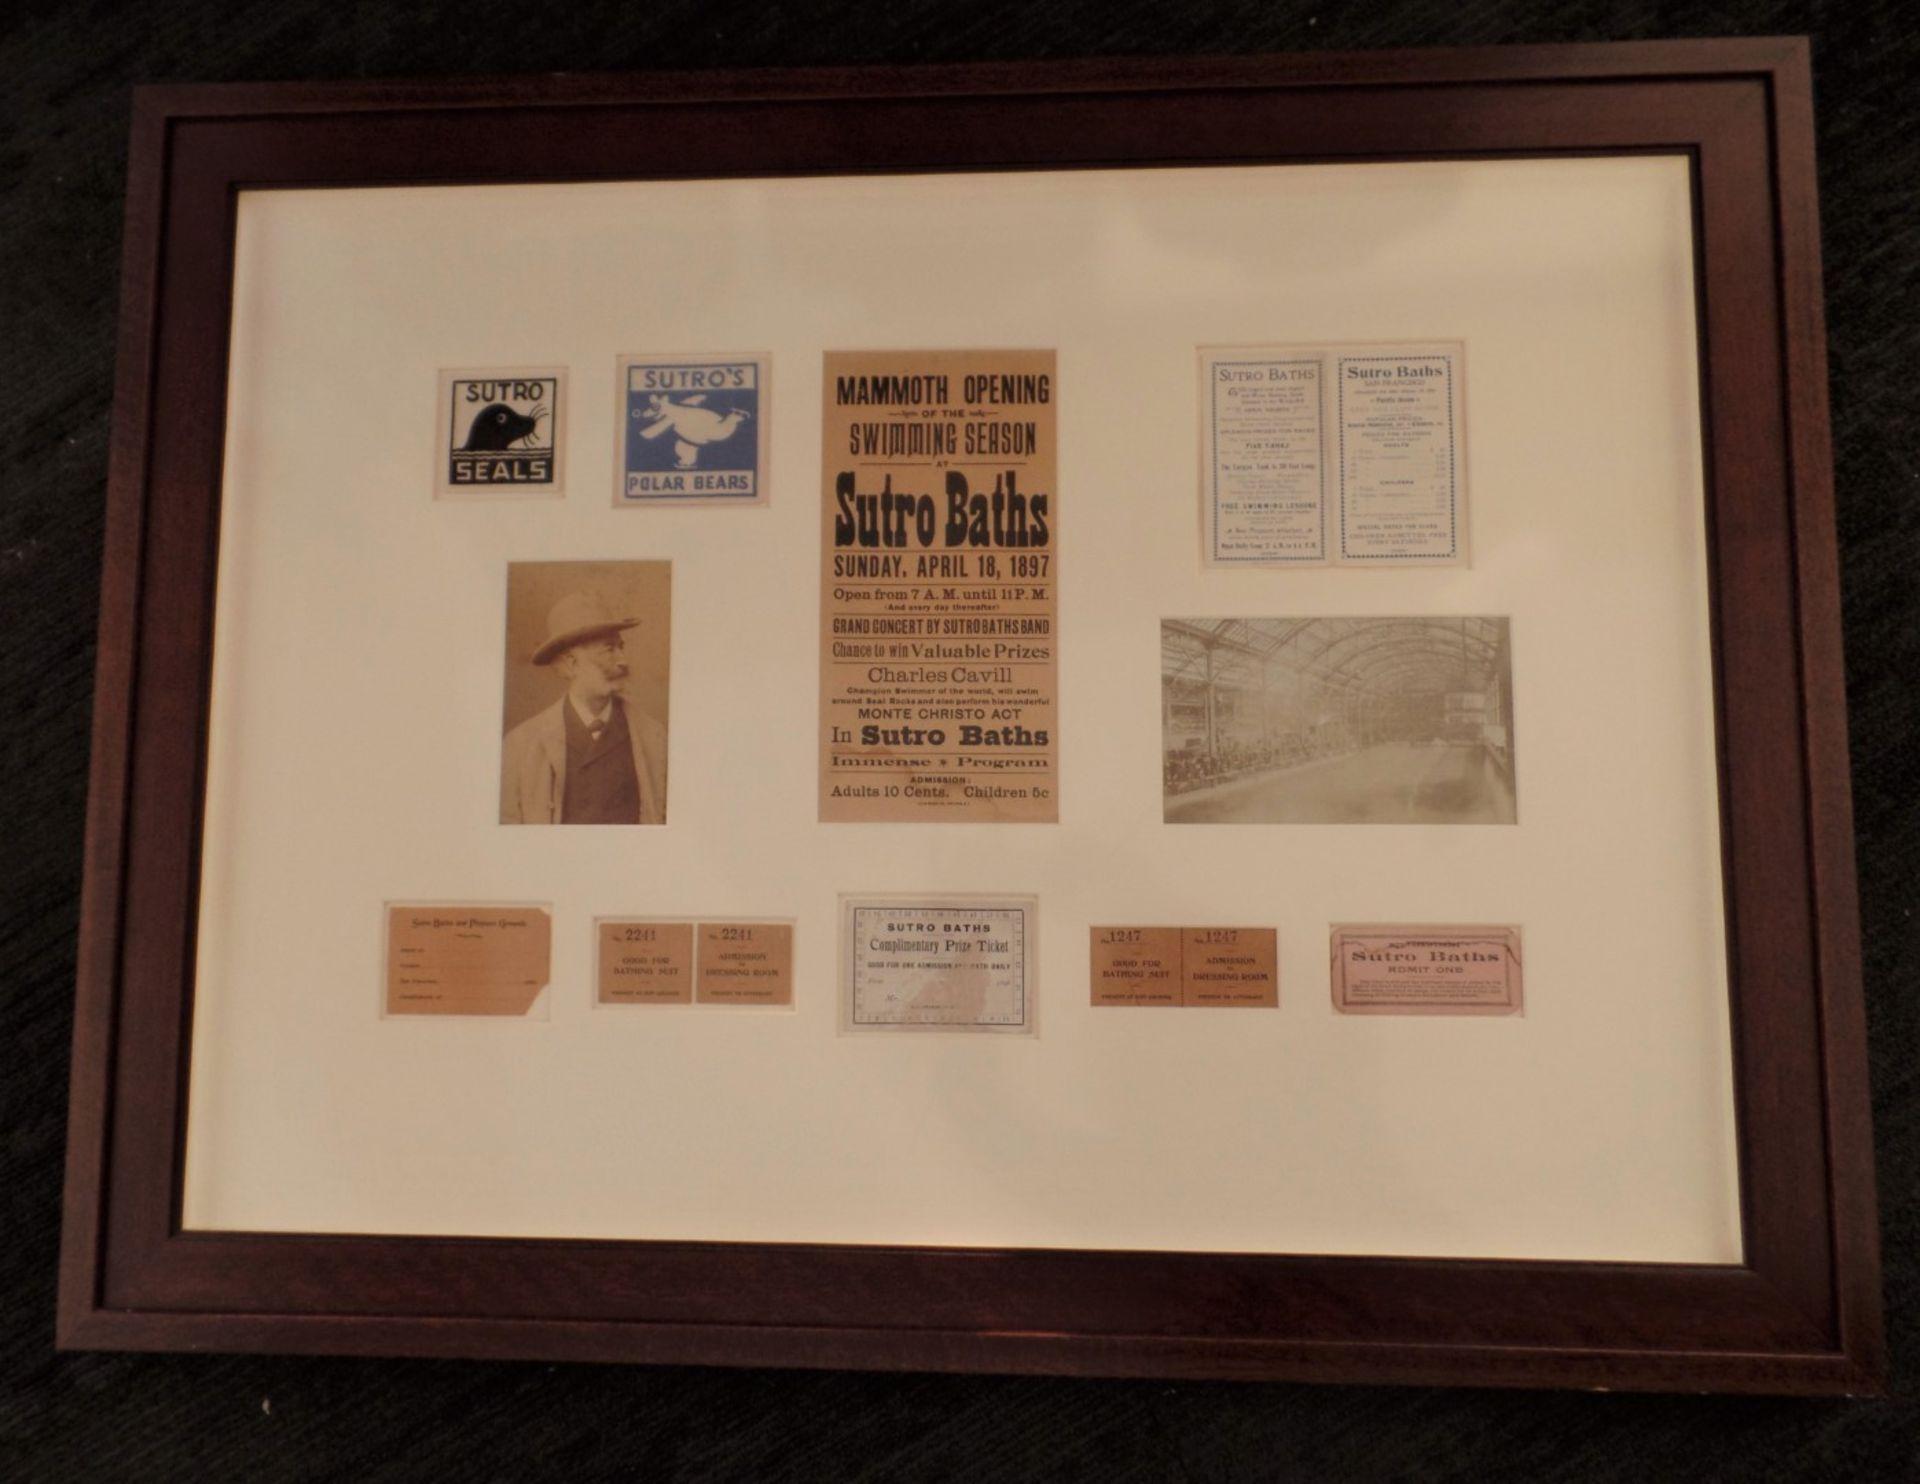 Framed Sutro Baths - Framed Mementos